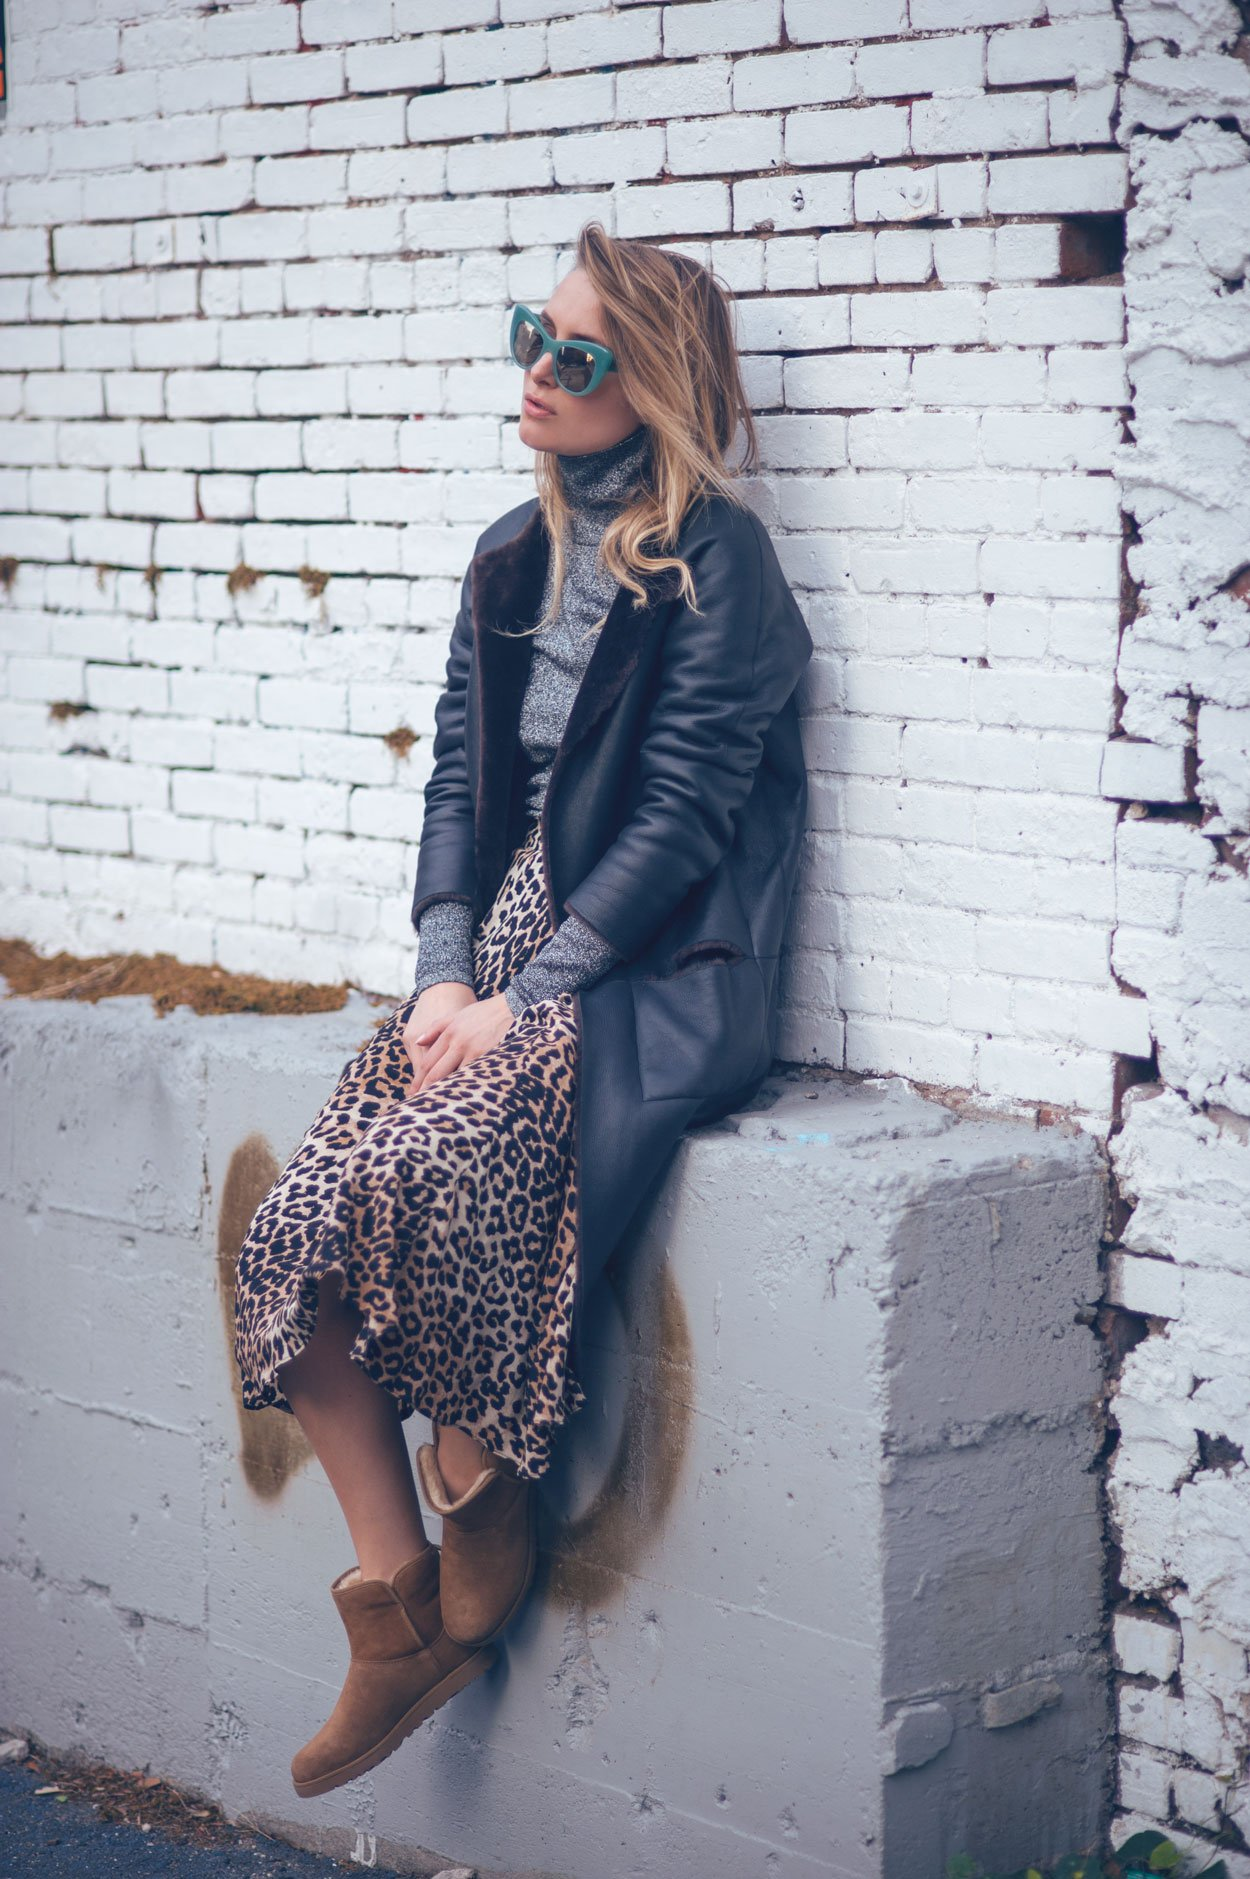 ugg boots fashion blogger